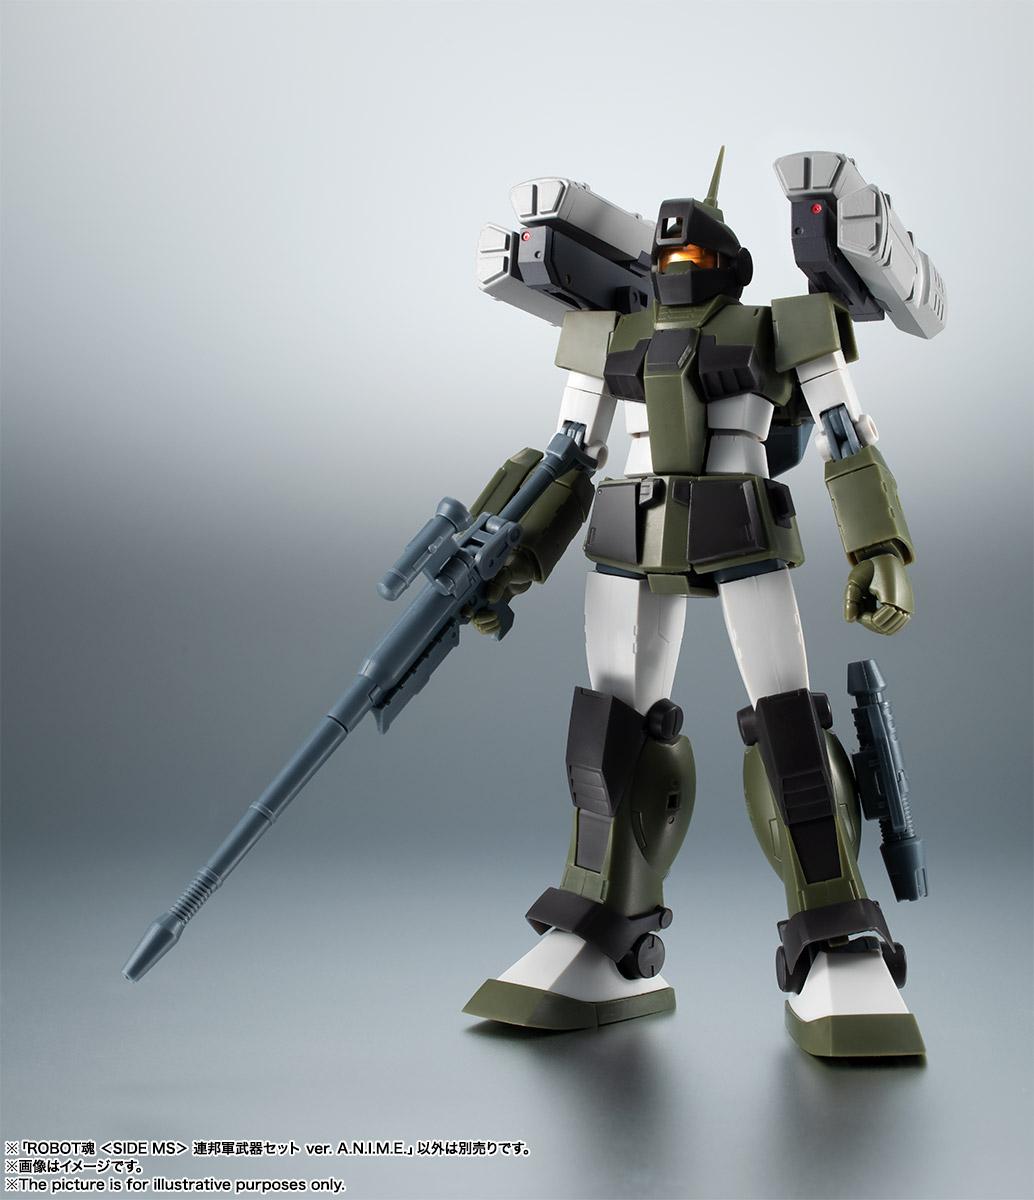 ROBOT魂〈SIDE MS〉『連邦軍武器セット ver. A.N.I.M.E.』ガンダム 完成品フィギュア-015